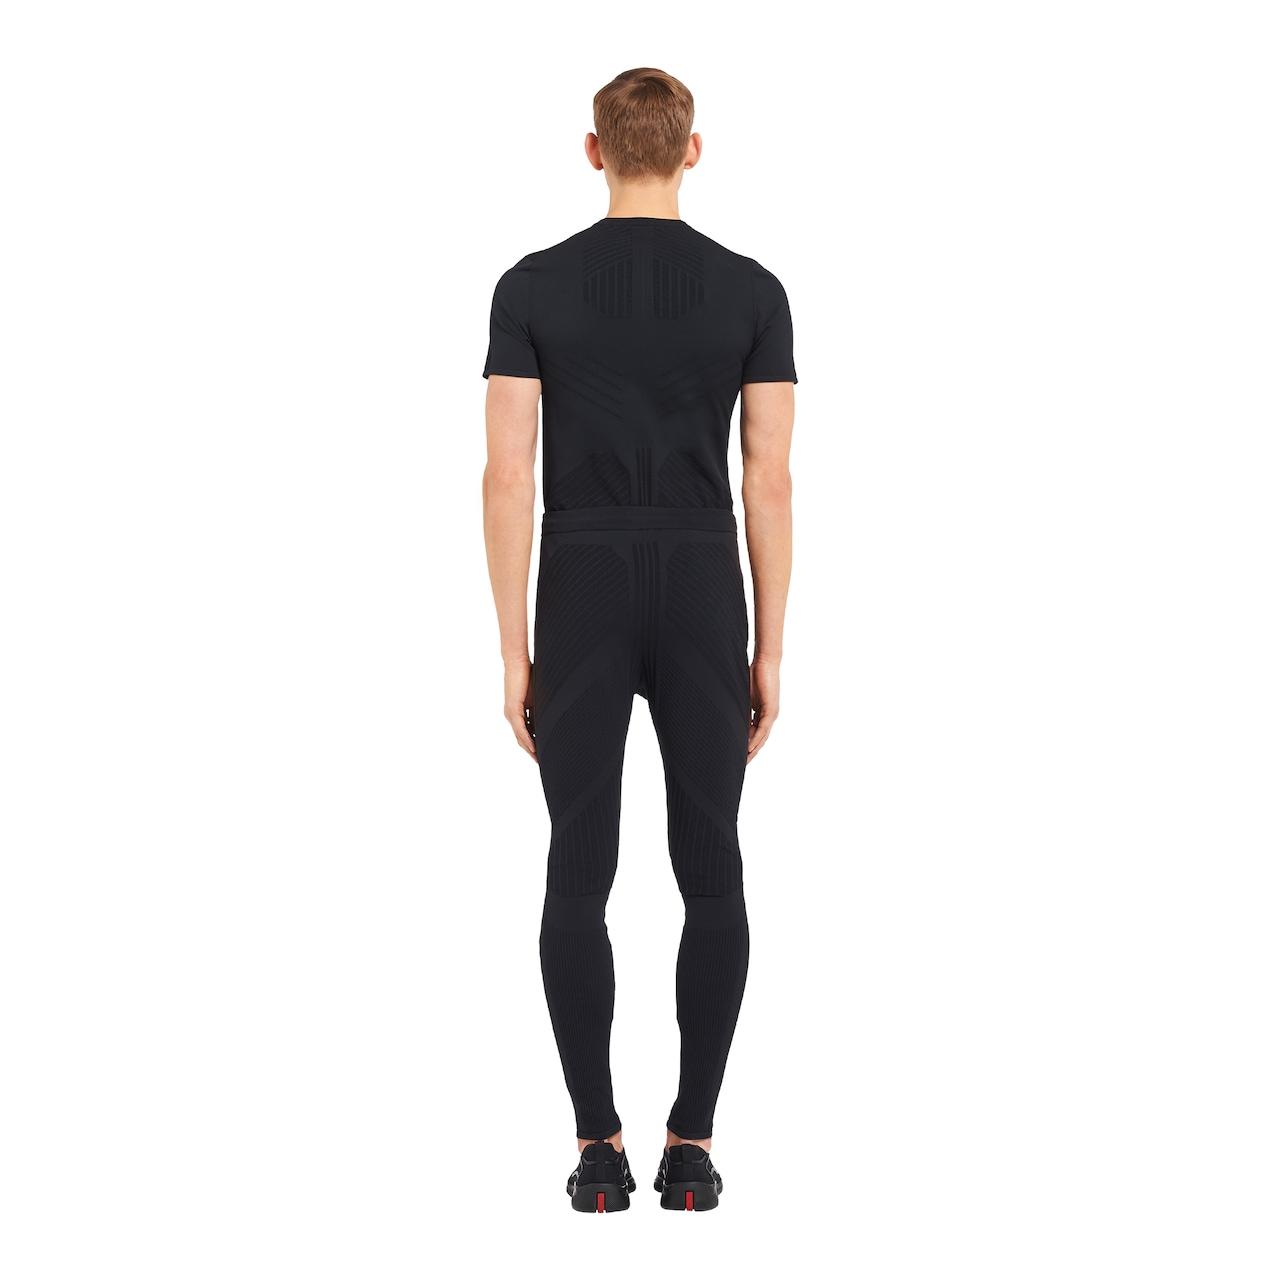 Light technical nylon trousers